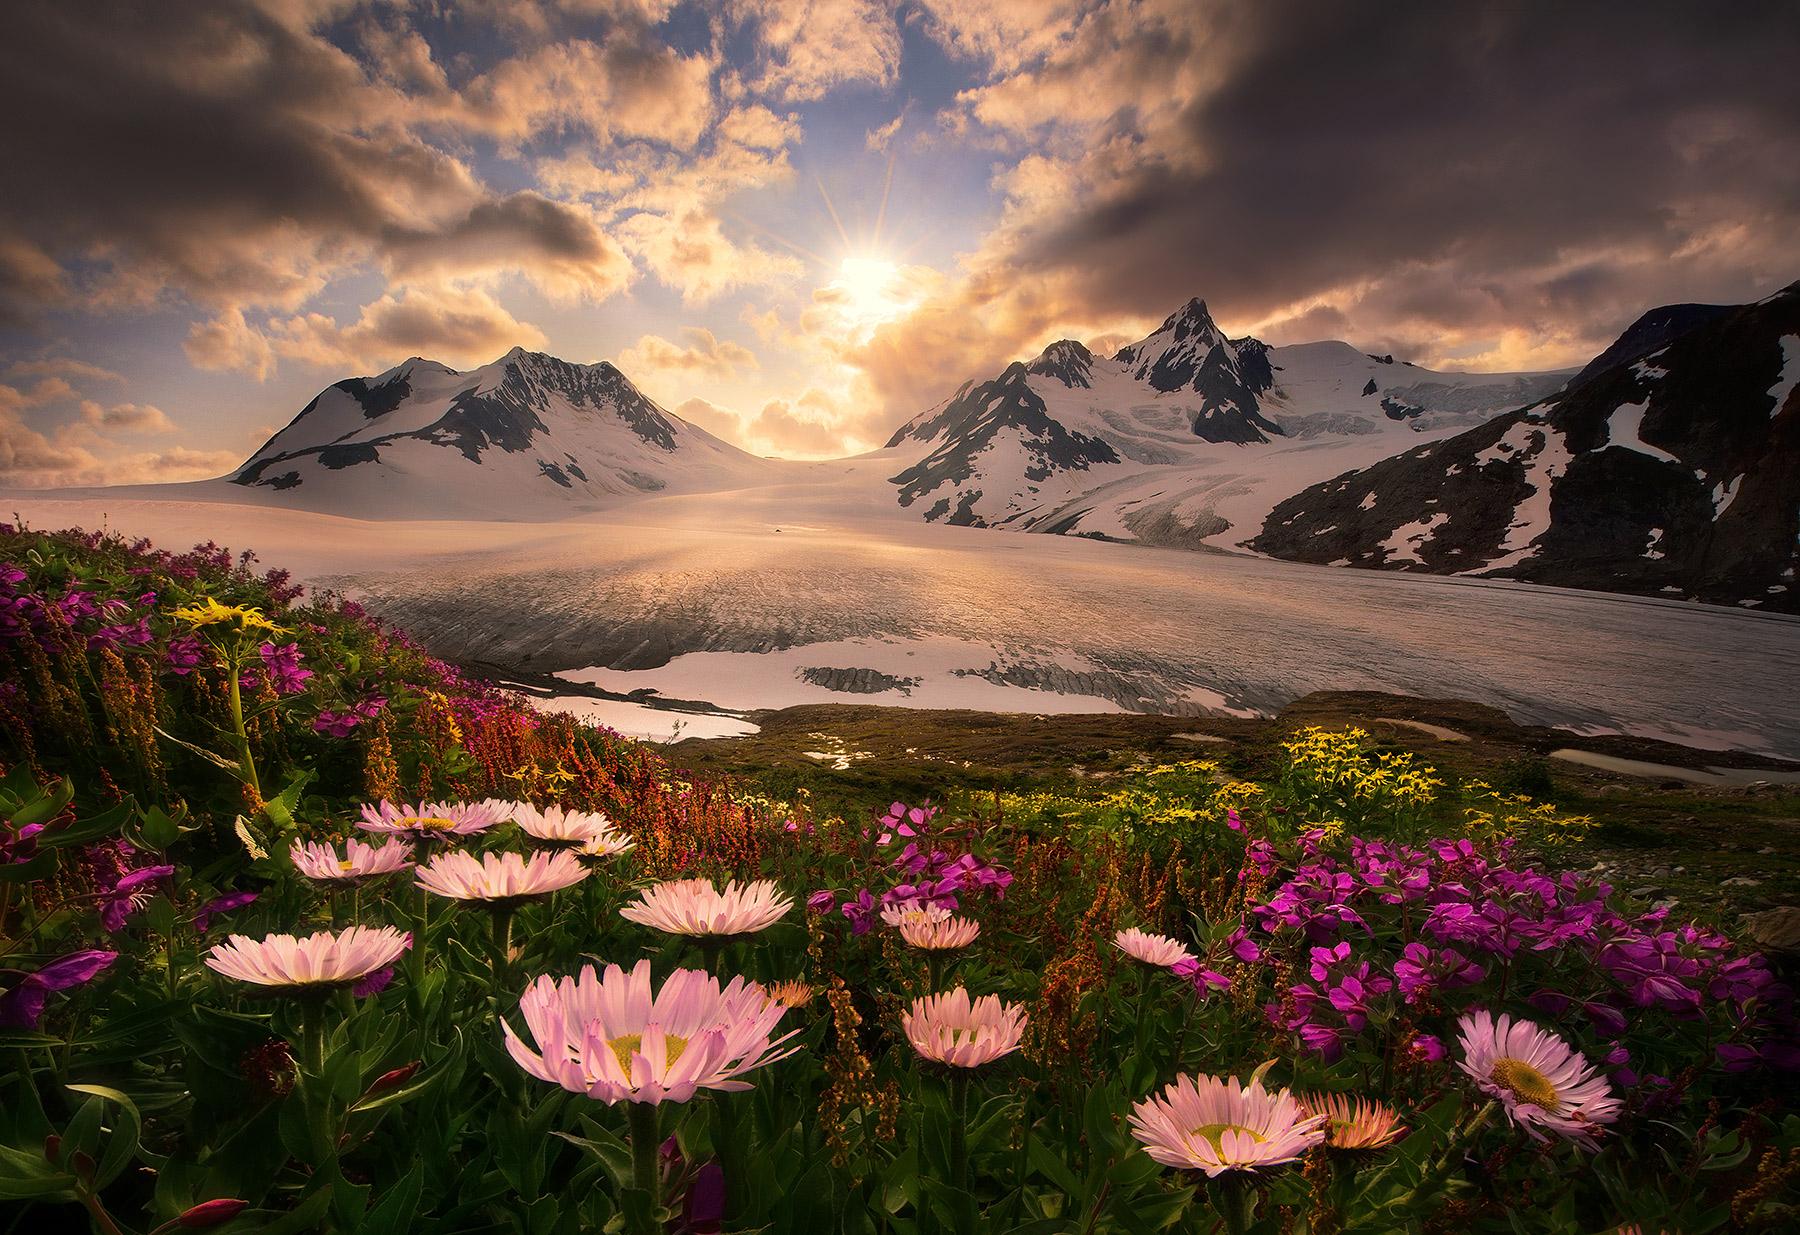 boundary range, Alaska, British Columbia, aster, flowers, summer, marc adamus, photo